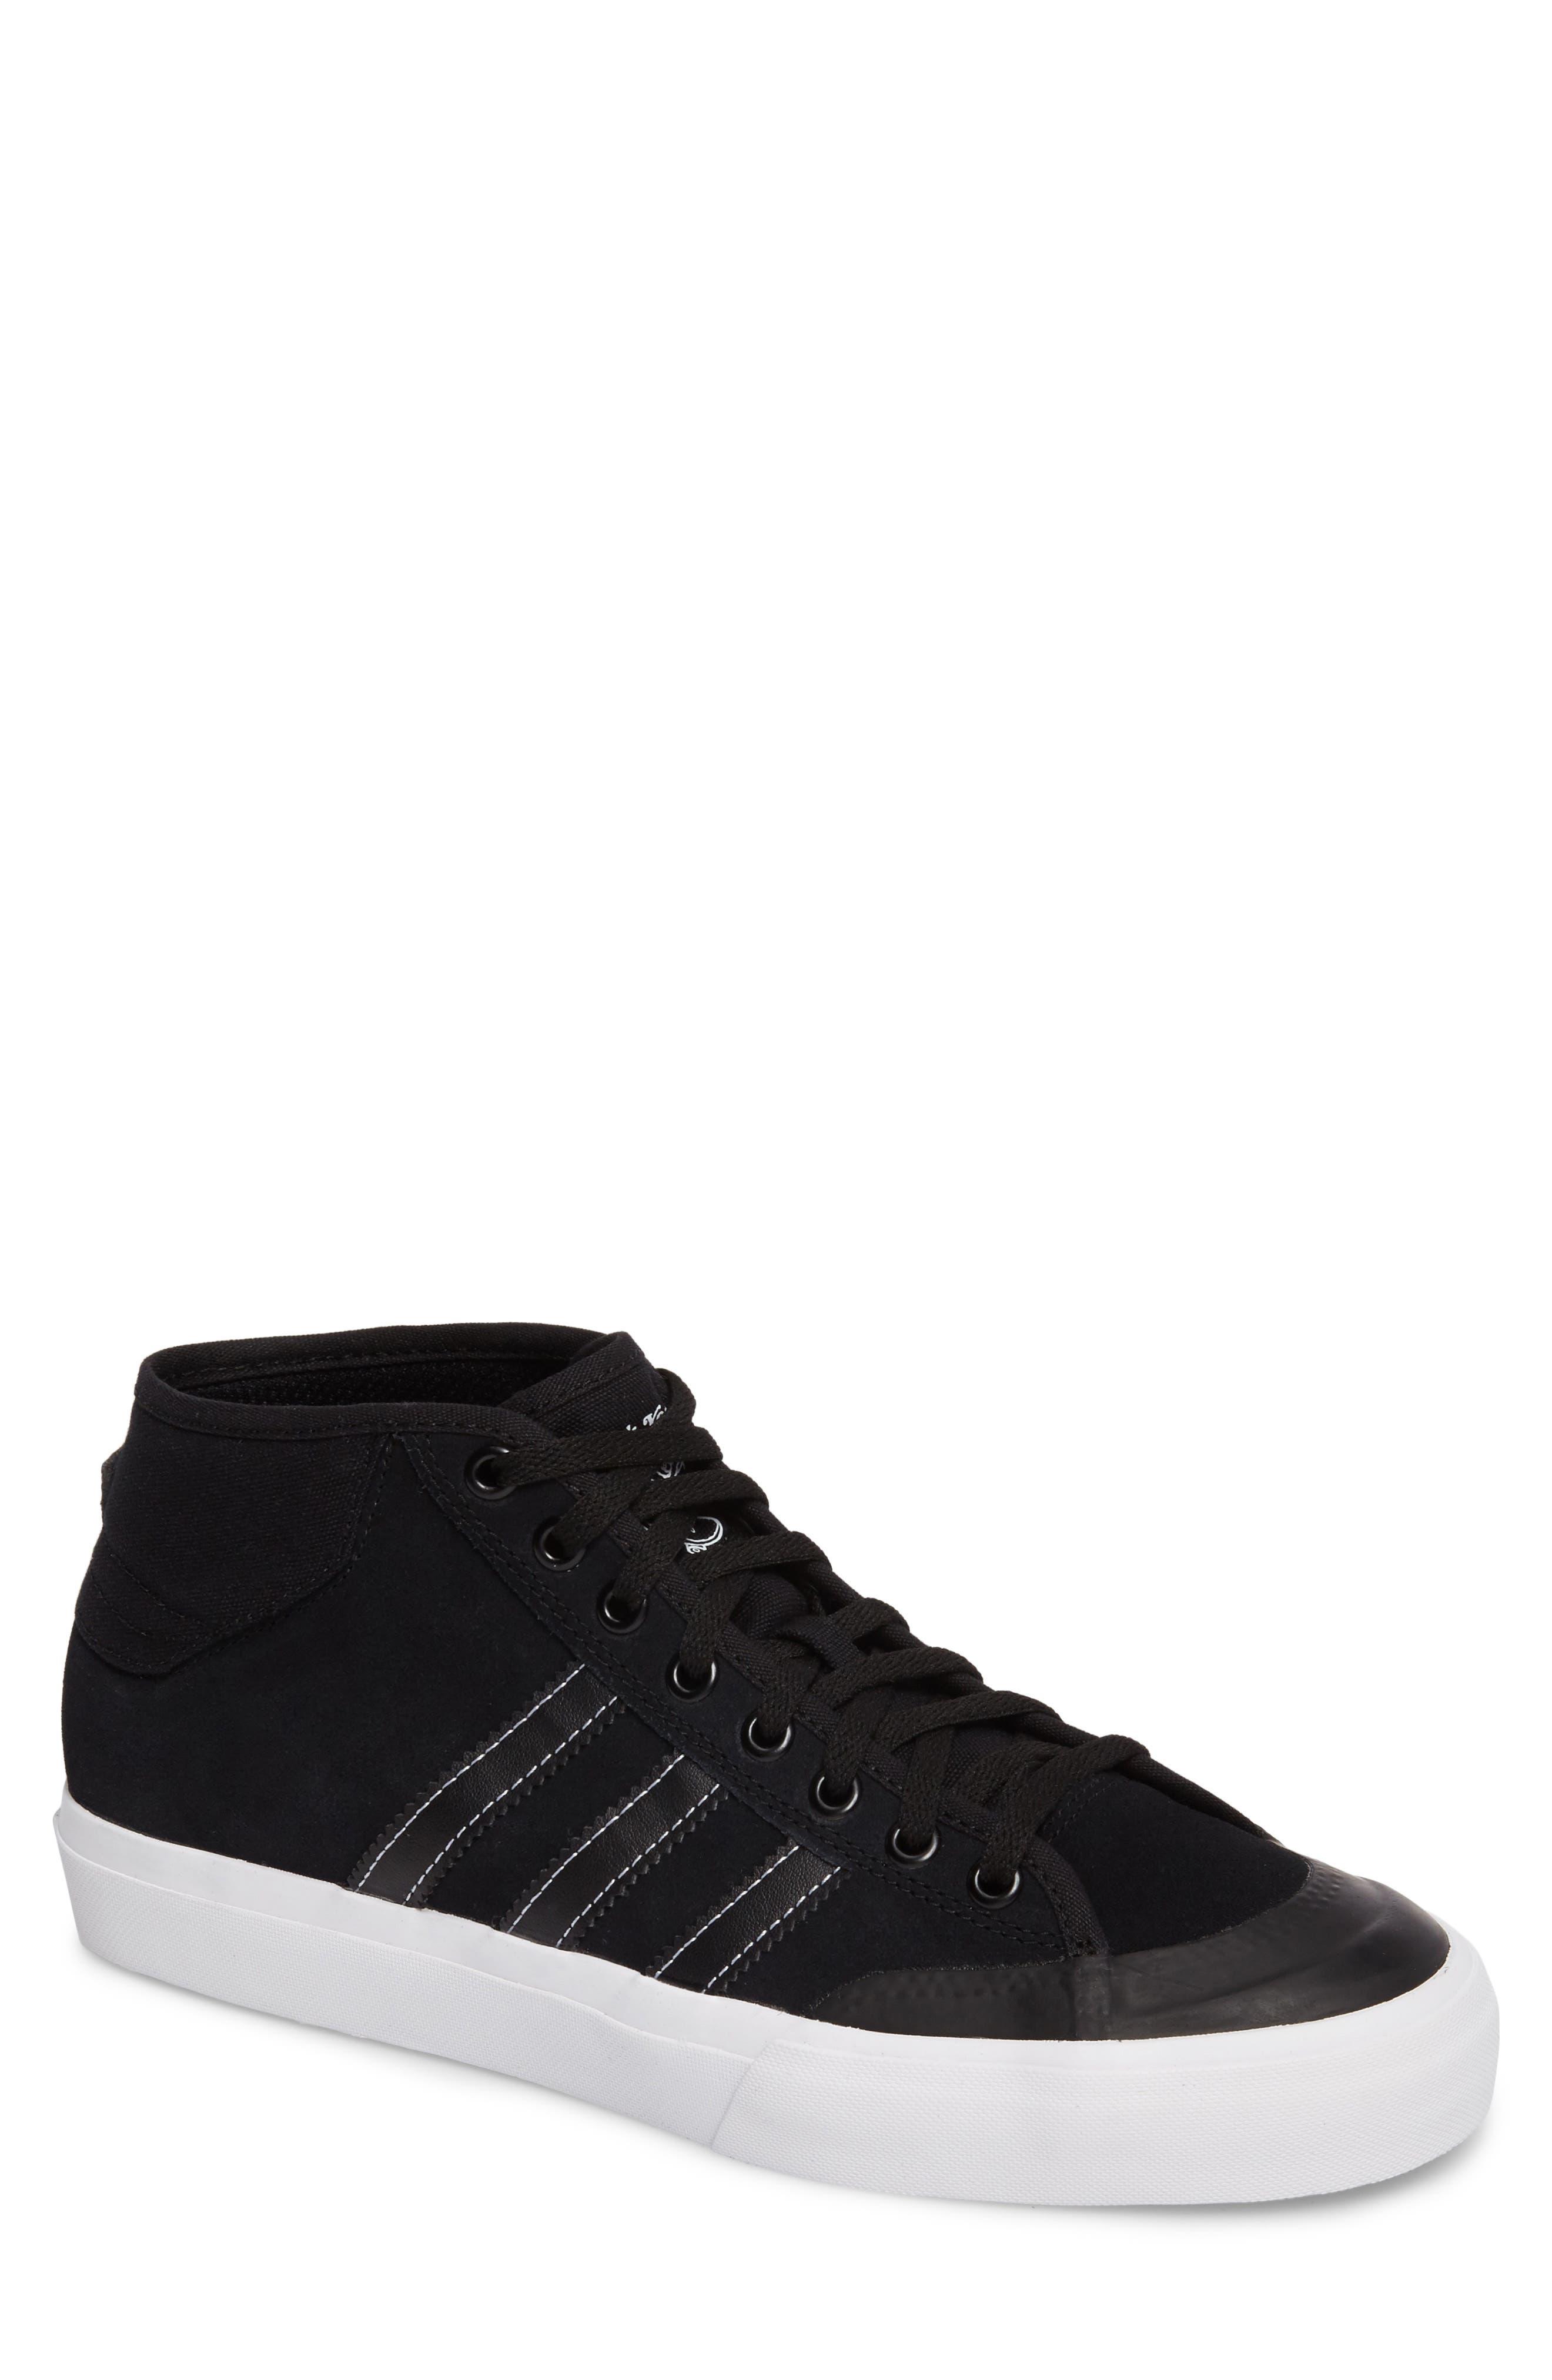 Main Image - adidas Matchcourt Mid ADV Sneaker (Men)